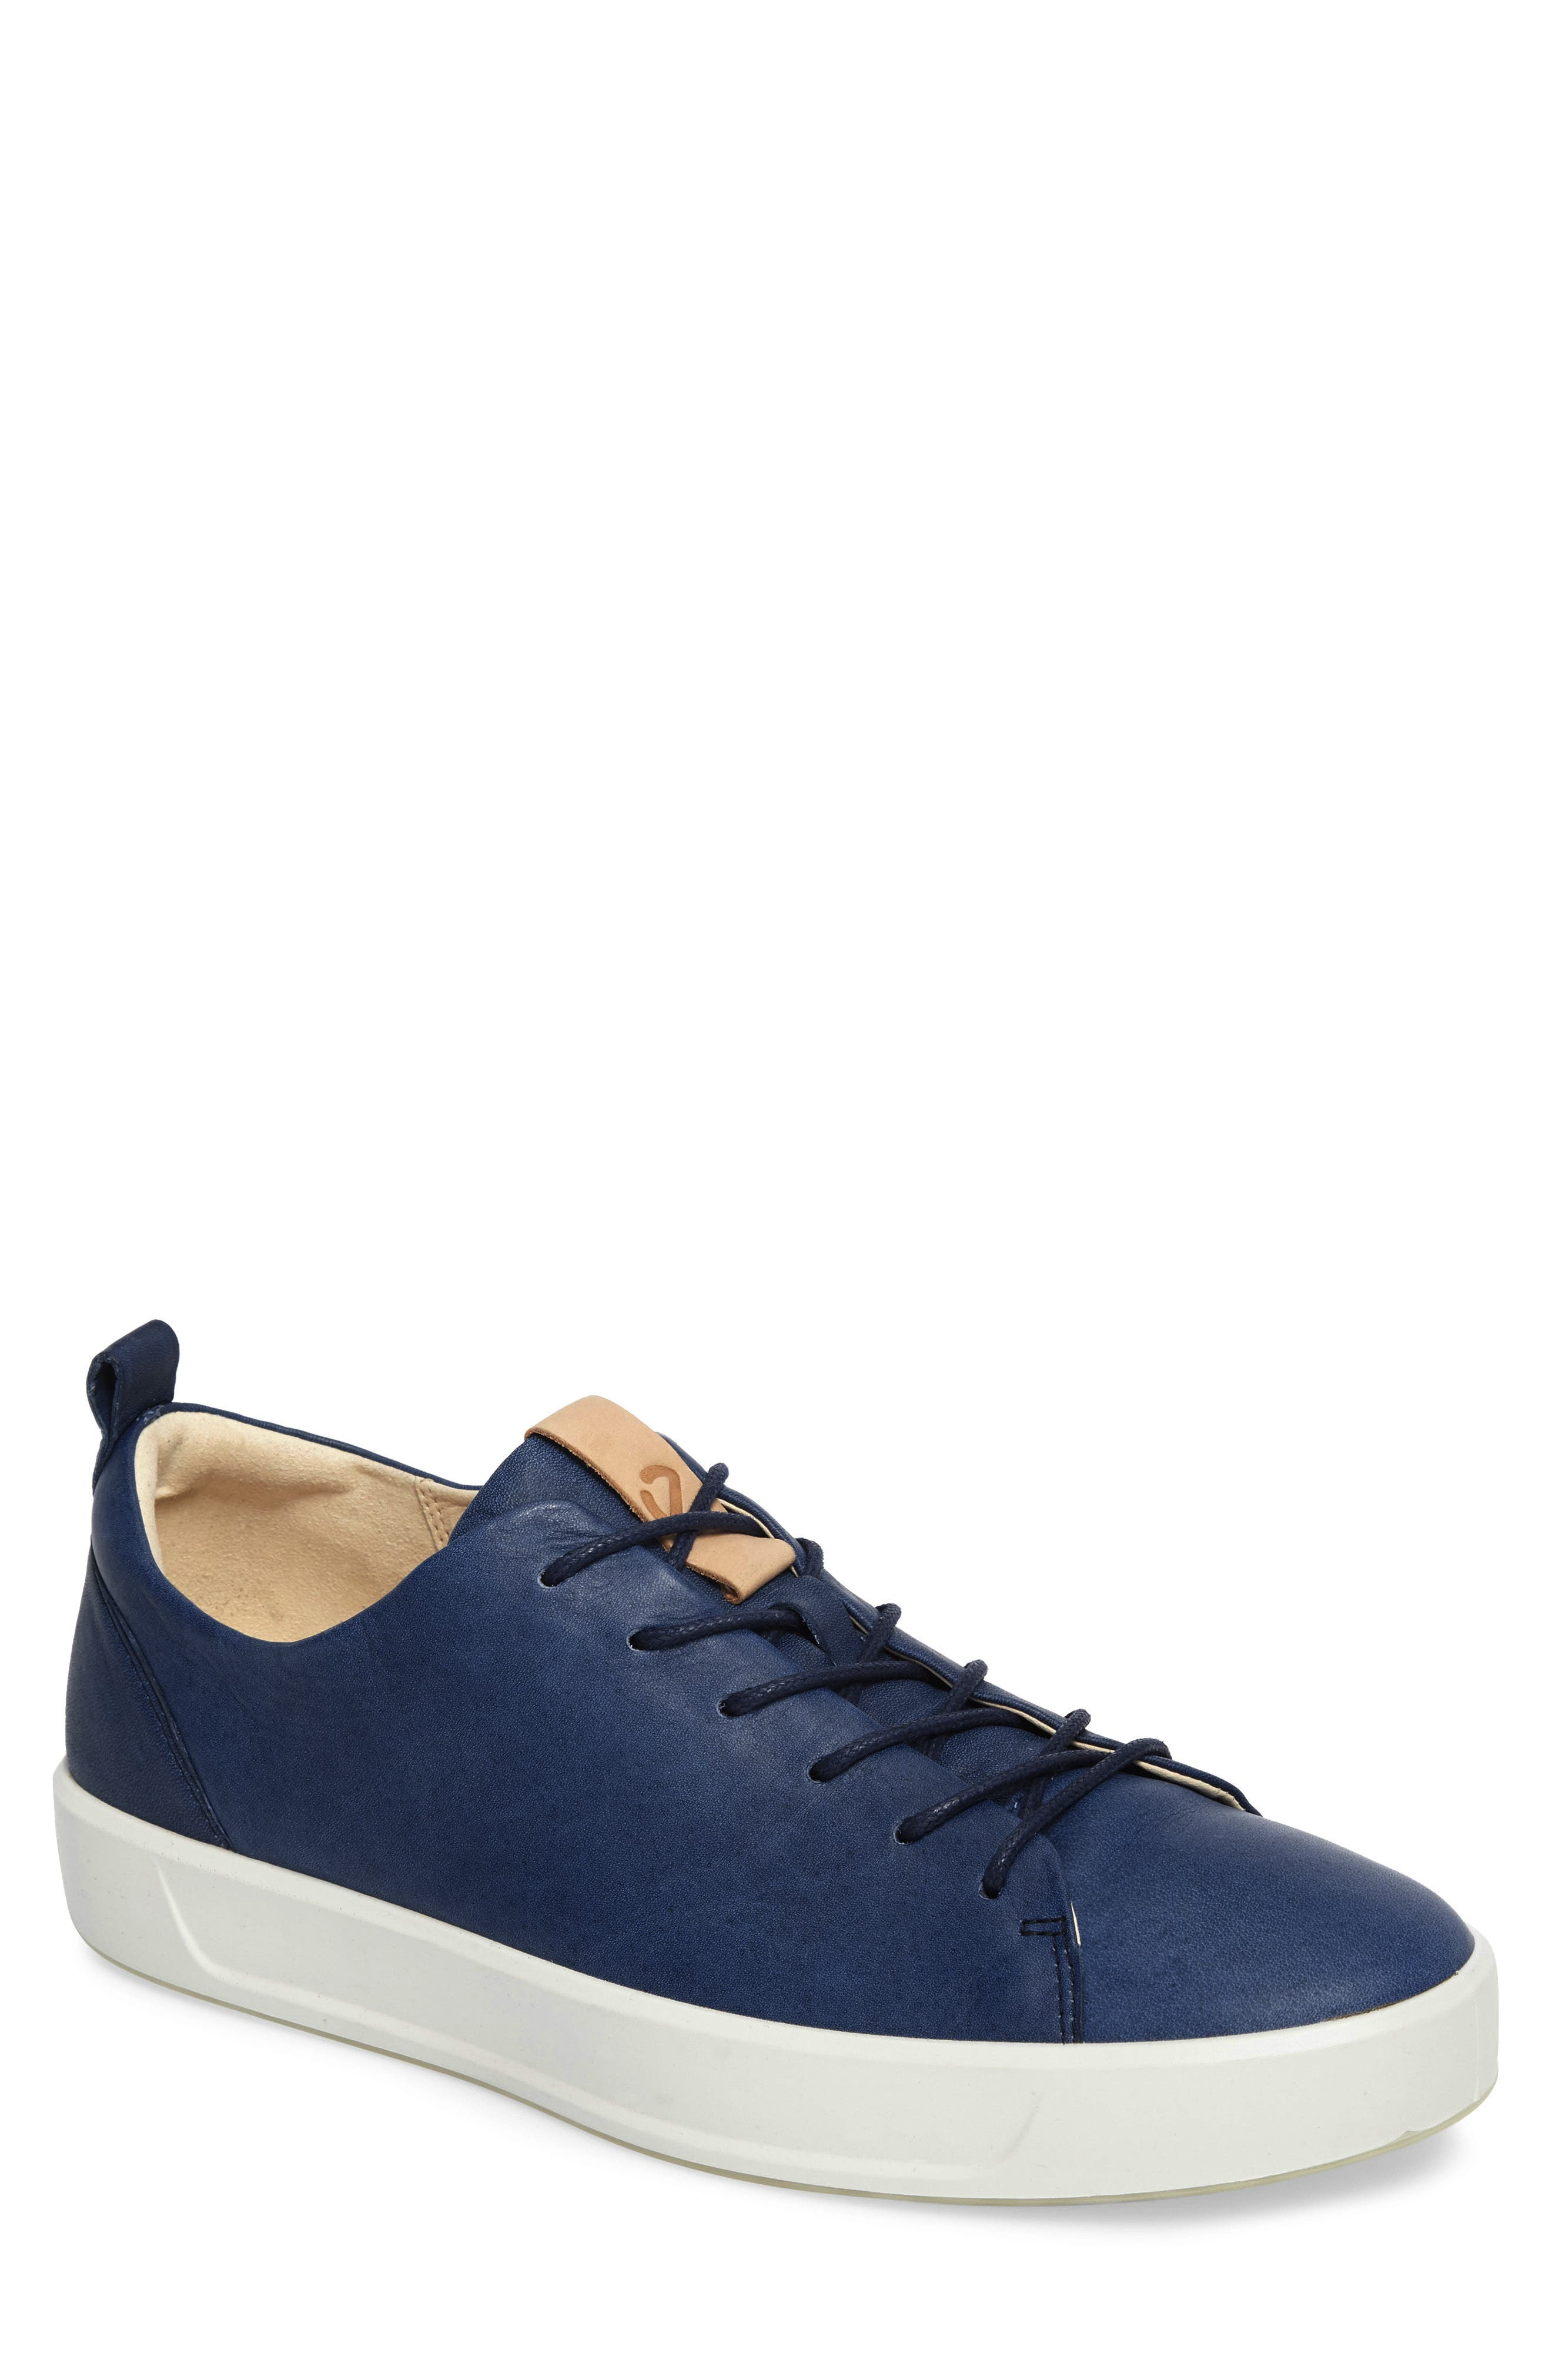 Soft 8 Sneaker,                         Main,                         color, INDIGO 7 LEATHER